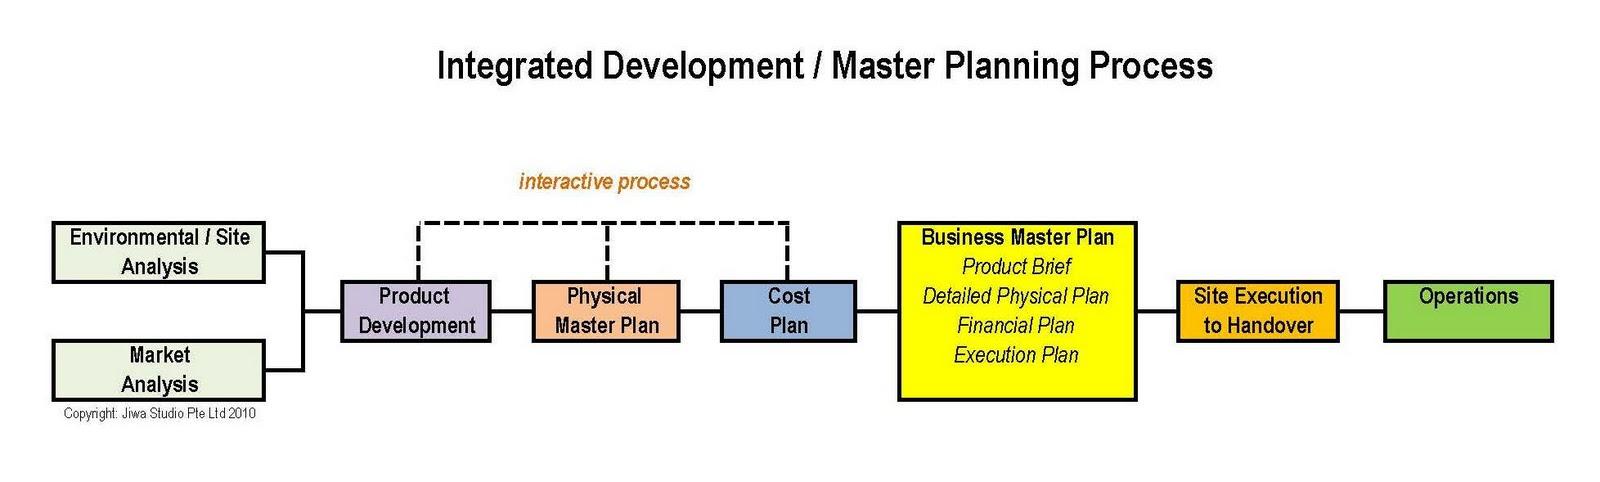 Monaghan integrated development business plan